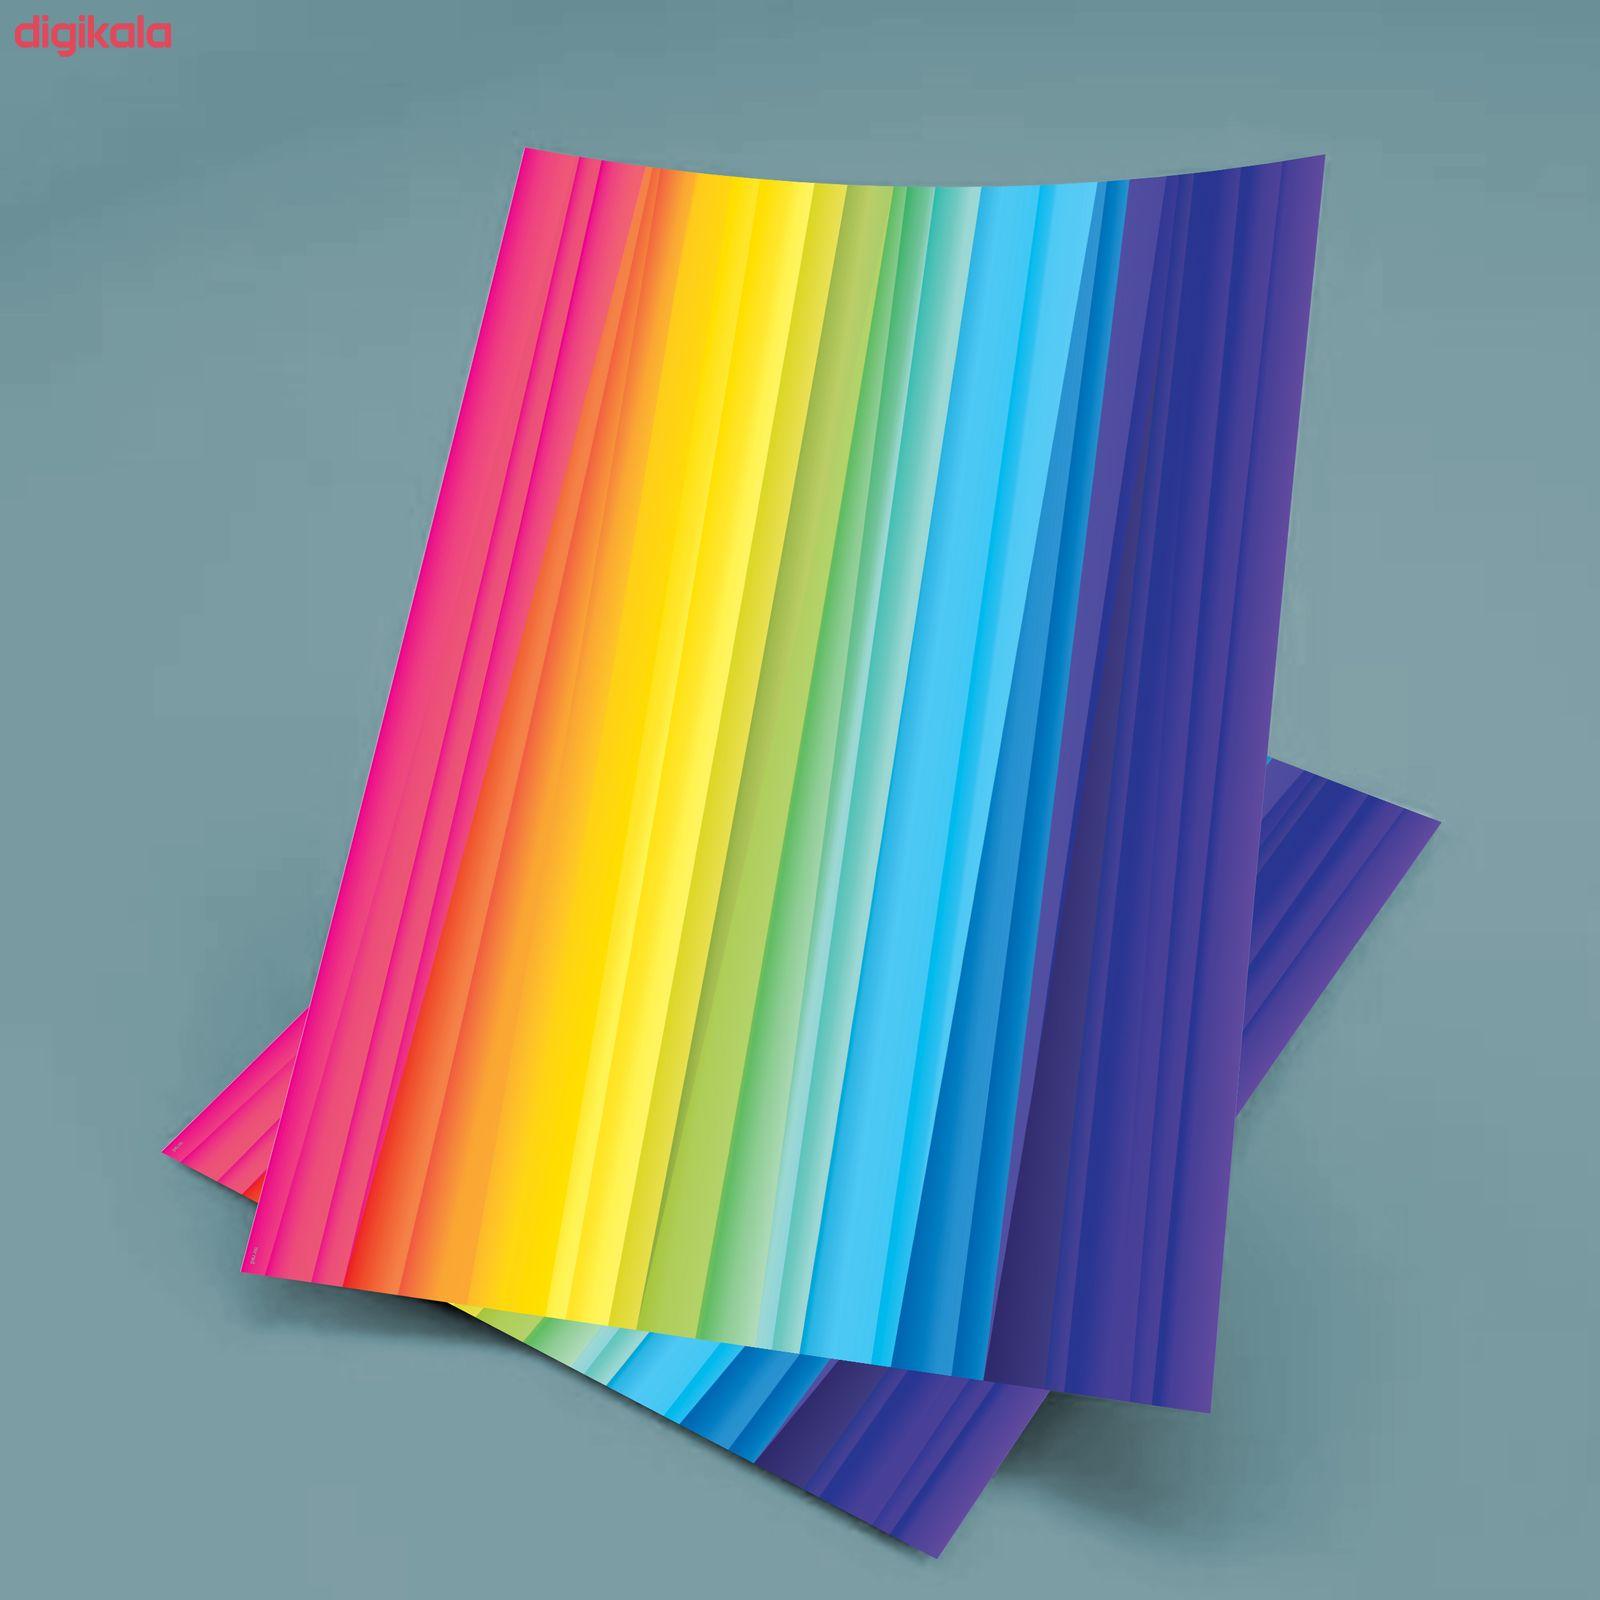 کاغذ رنگی A4 مستر راد مدل رنگارنگ بسته 10 عددی main 1 15